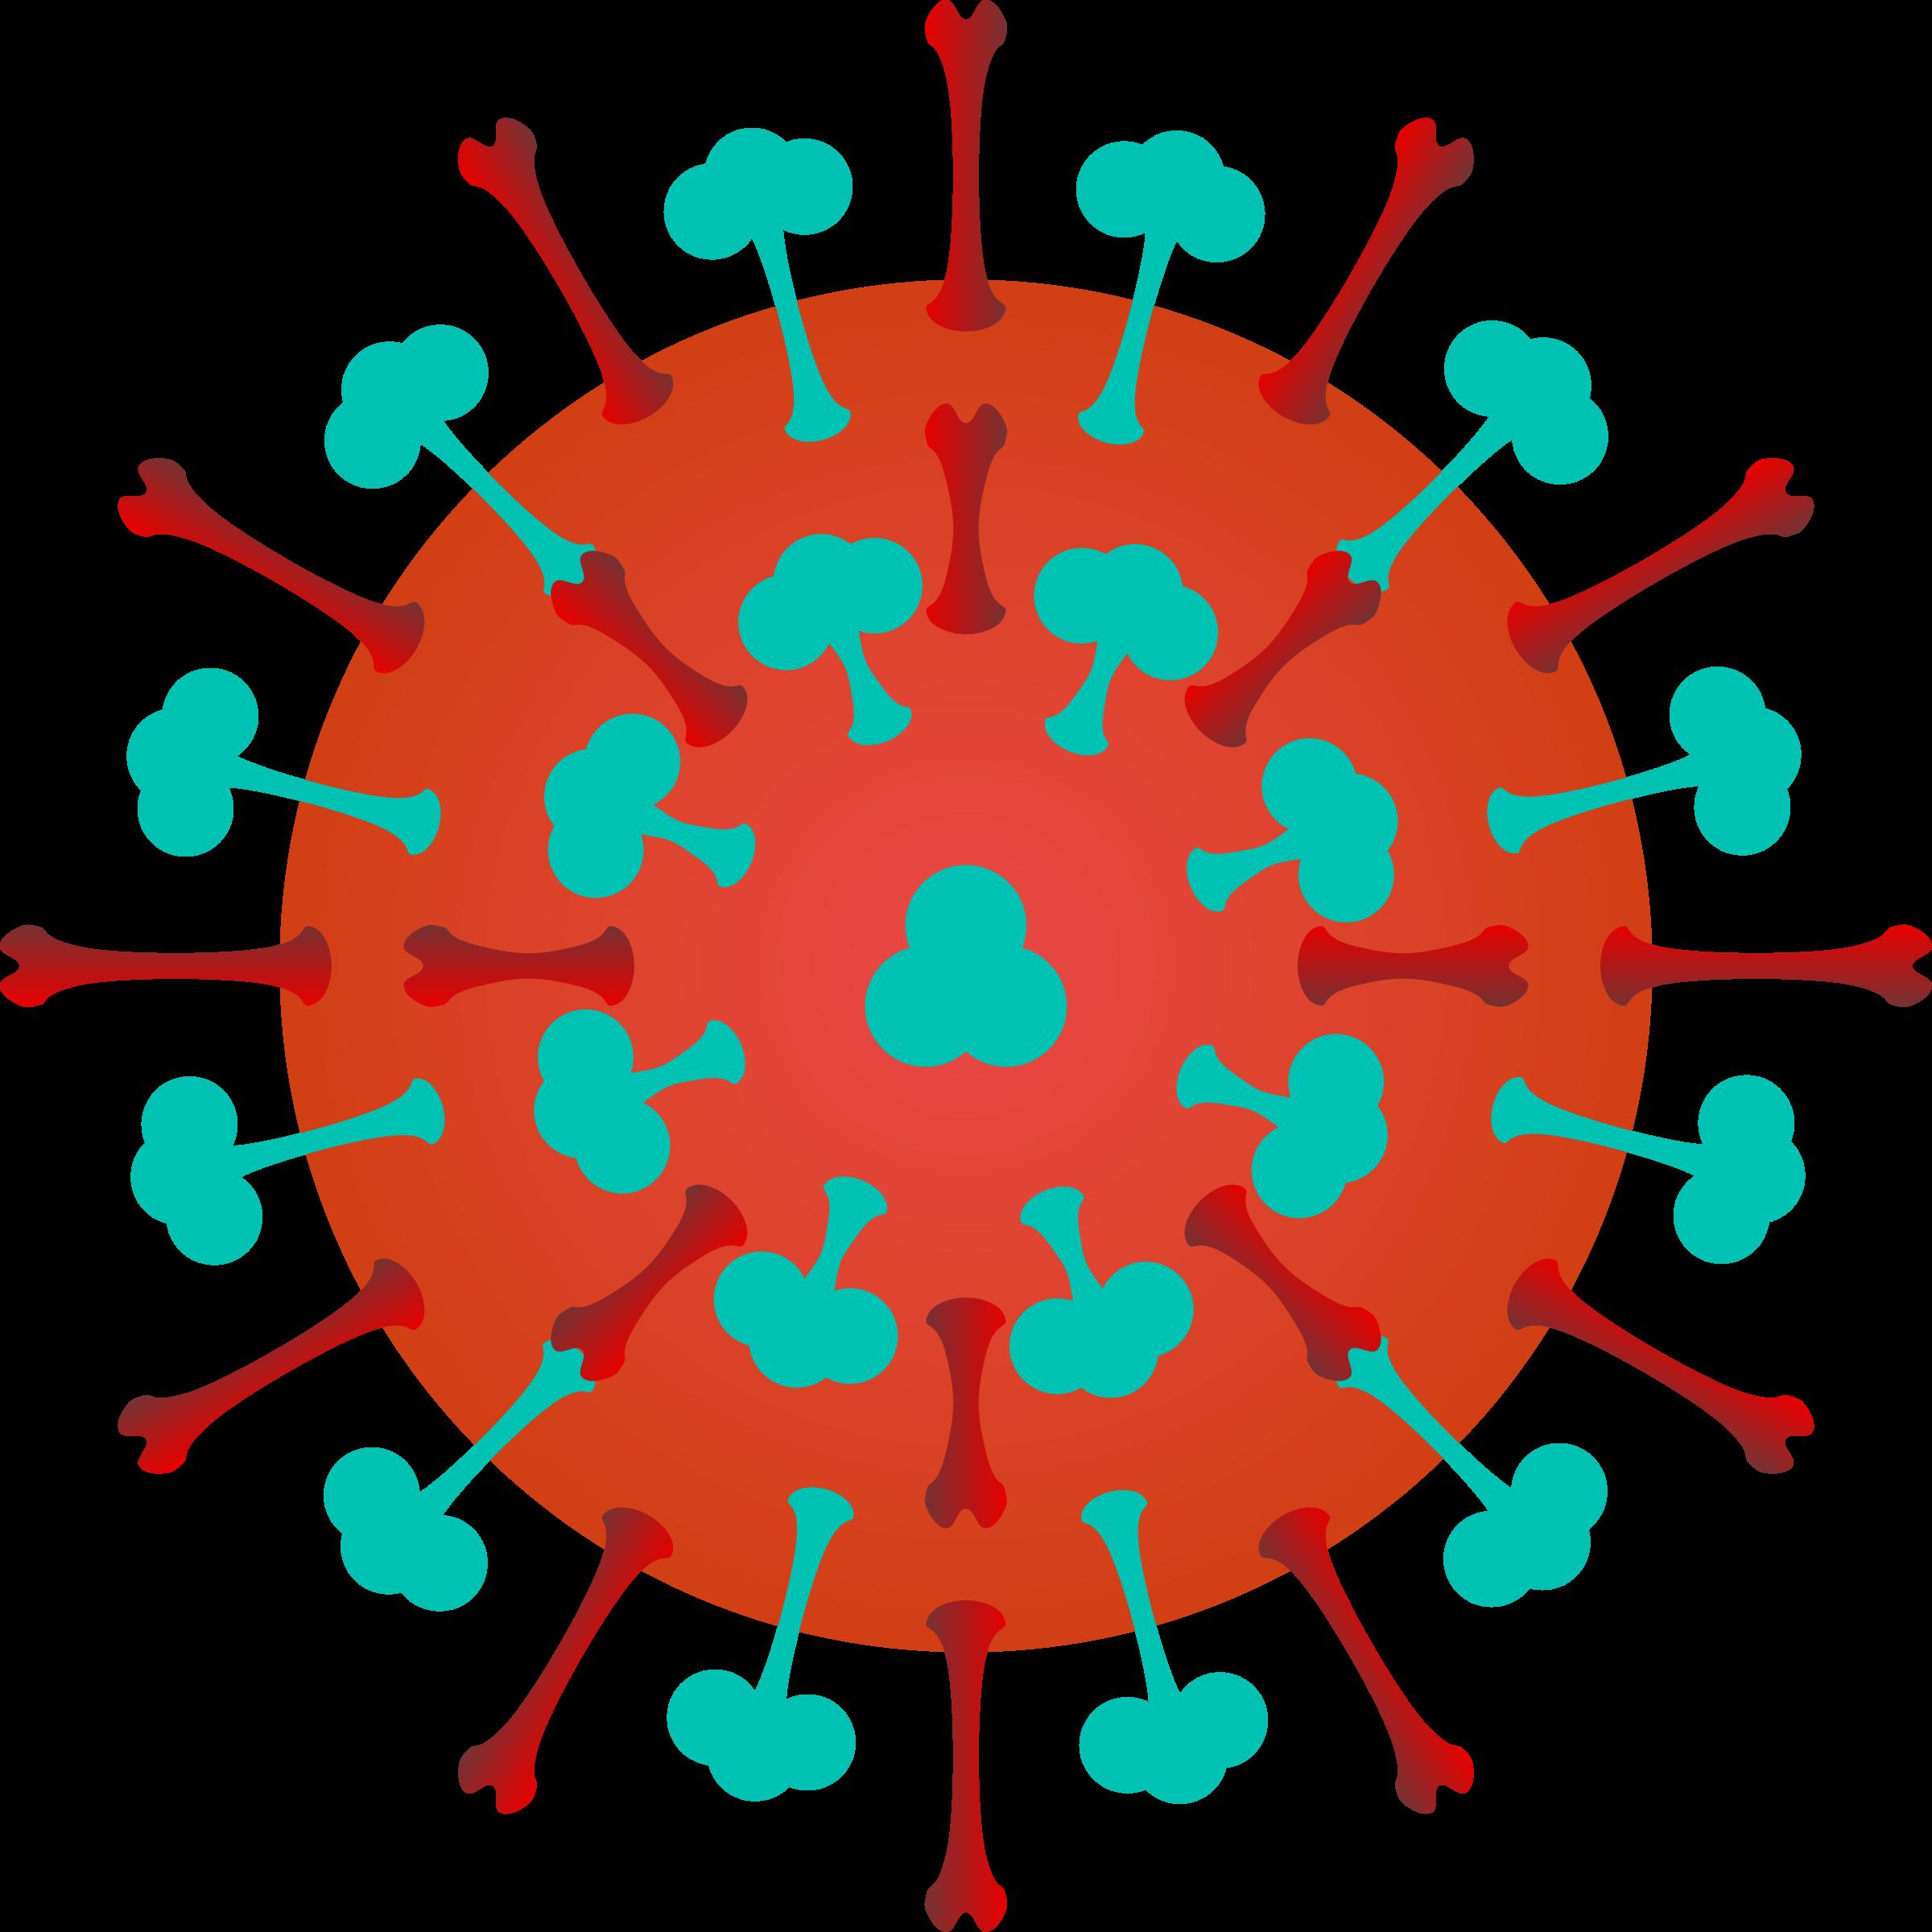 jpg freeuse library Flu virus clipart. Germ frames illustrations hd.